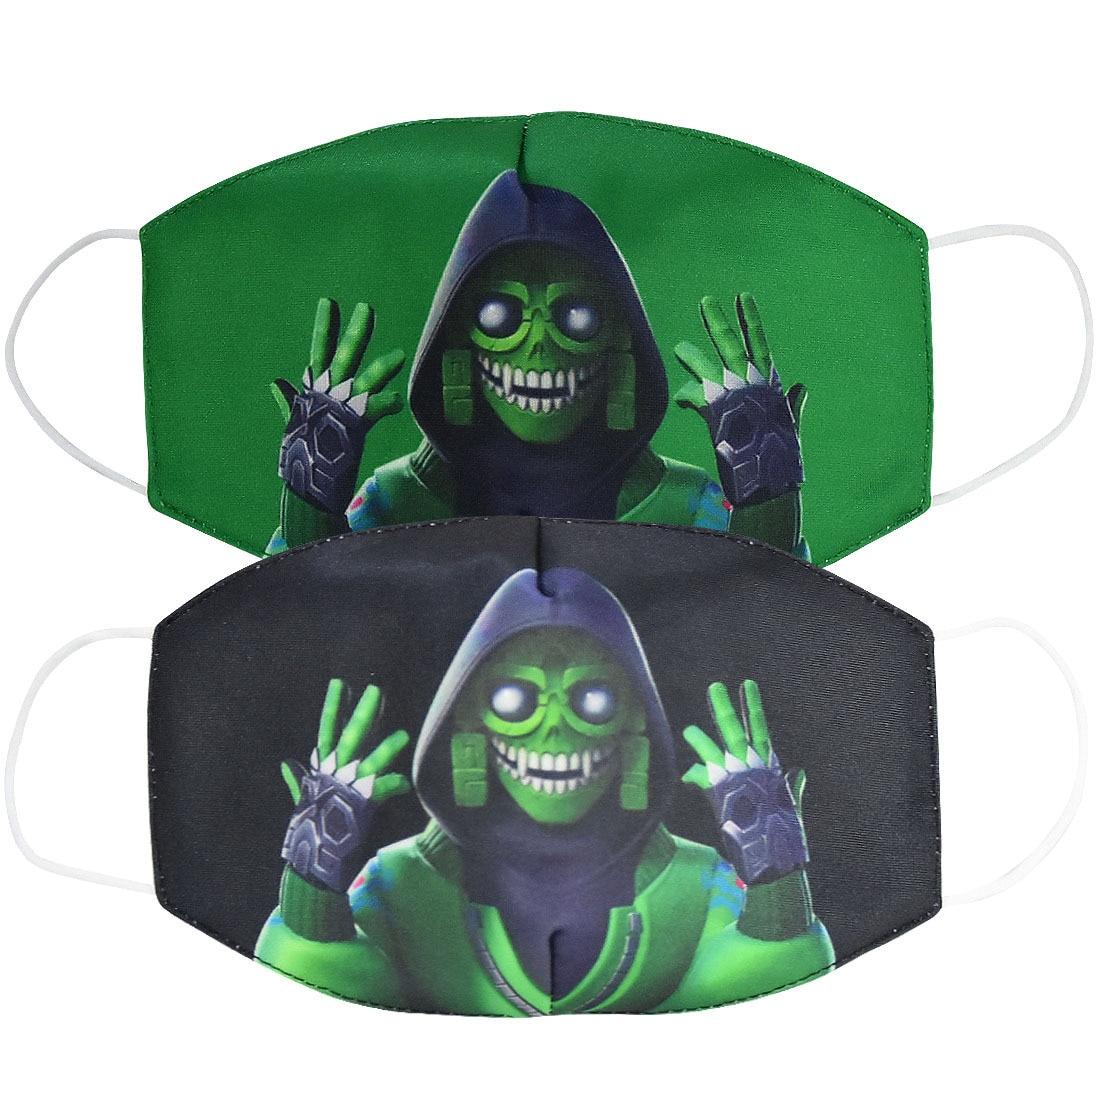 Hot Fortnite Anti Dust Face Mask Reusable Breathable Cotton Protective Children Cartoon Figure Anti-Dust Mouth Caps Washable